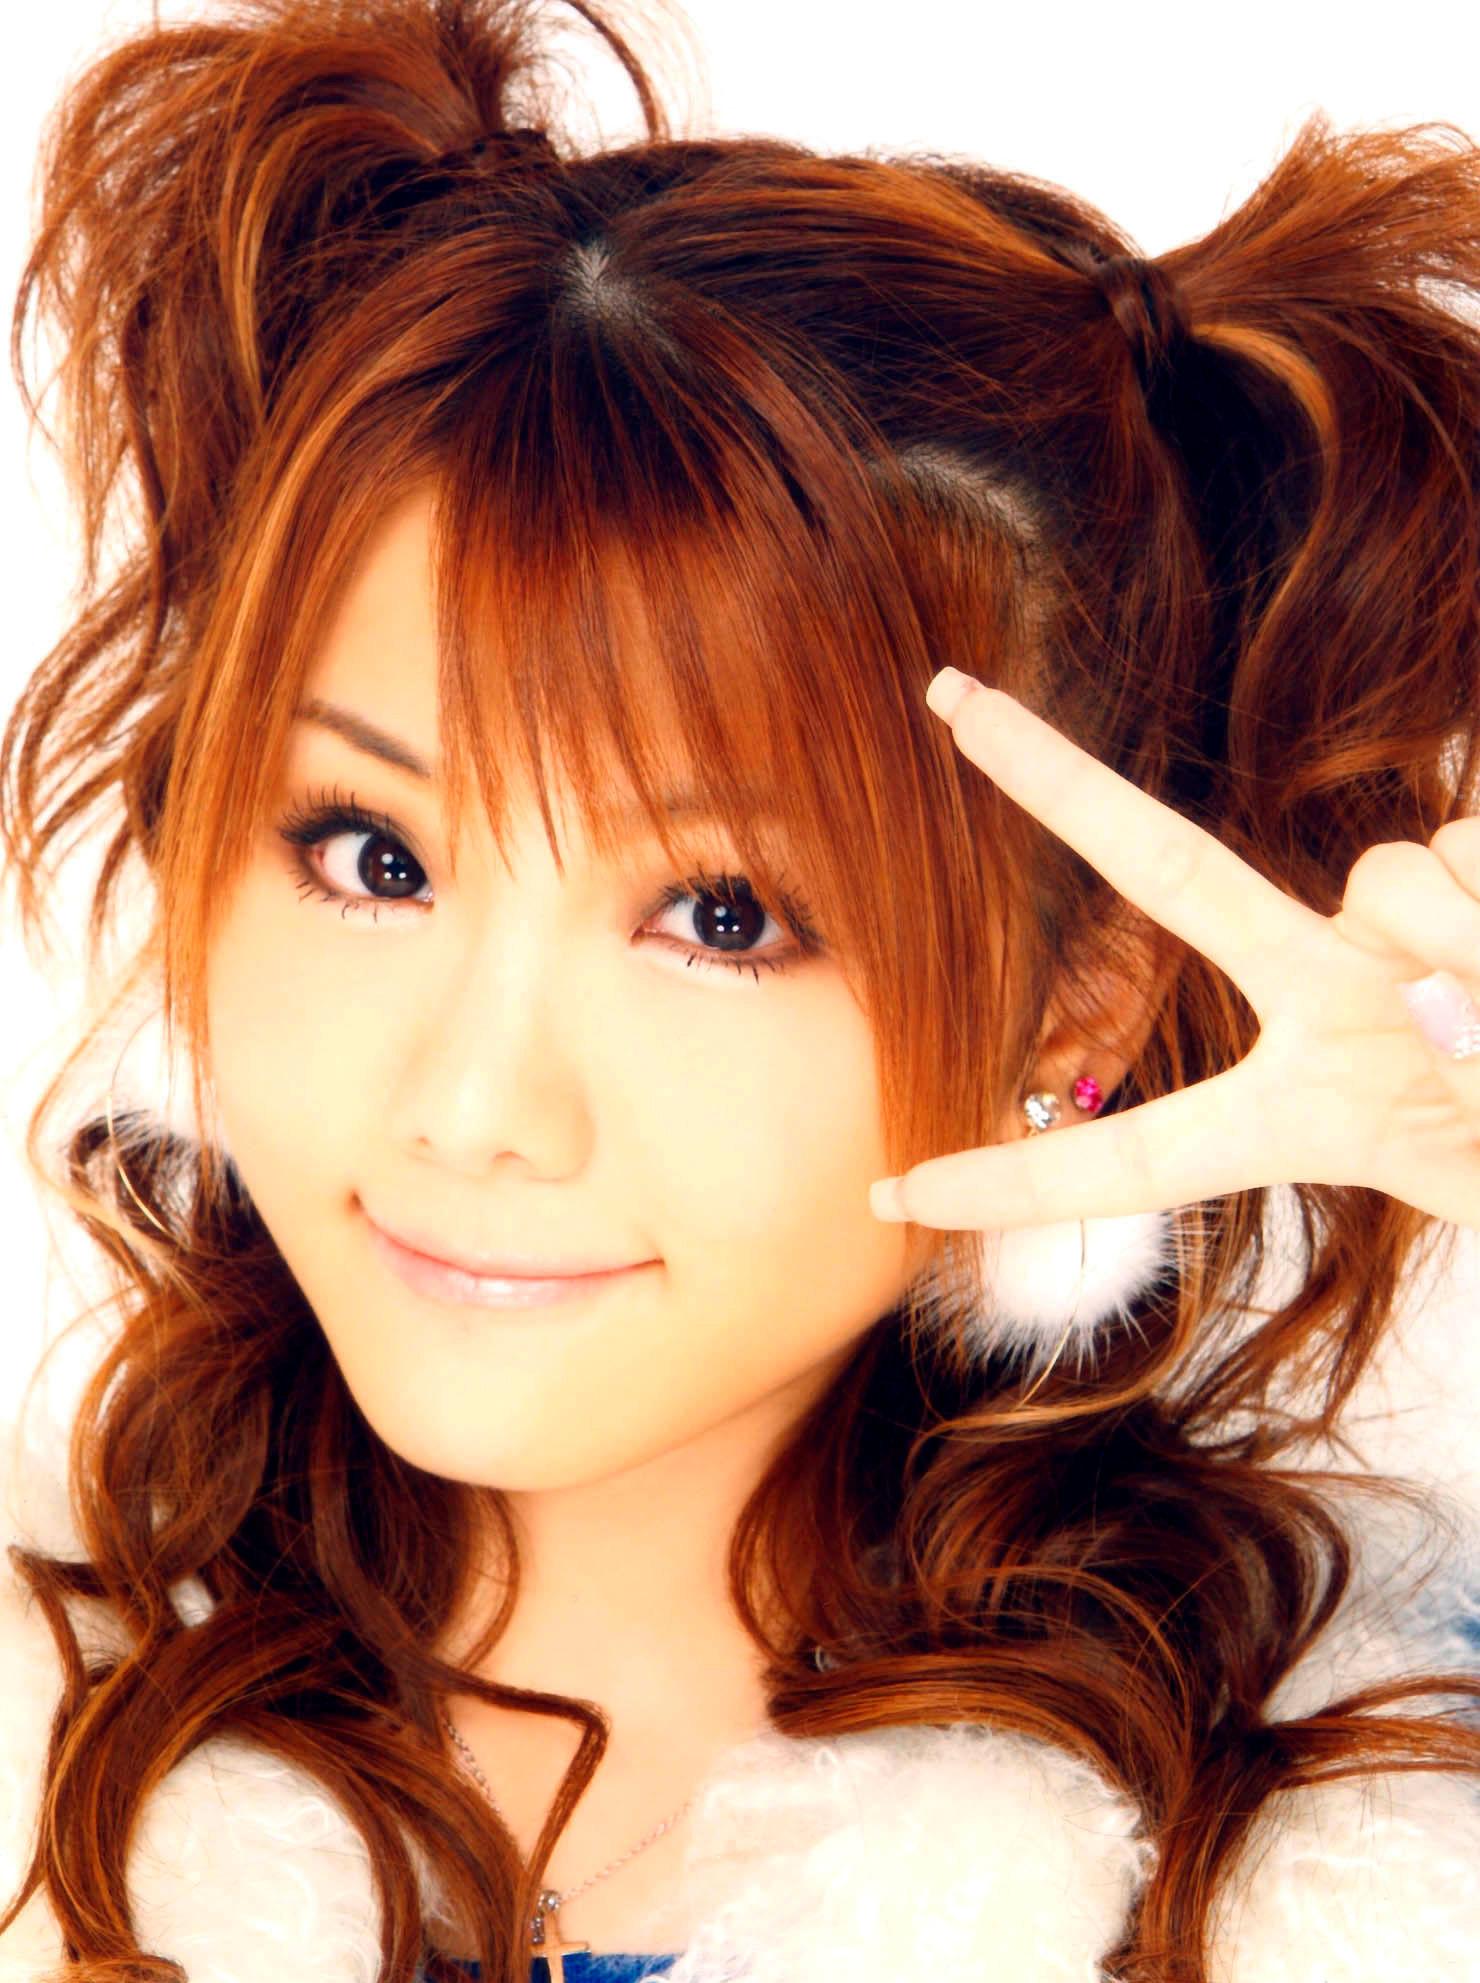 Hitomi Kudo http://hellosayunii.com/2010/02/24/tanaka-reinas-five ...